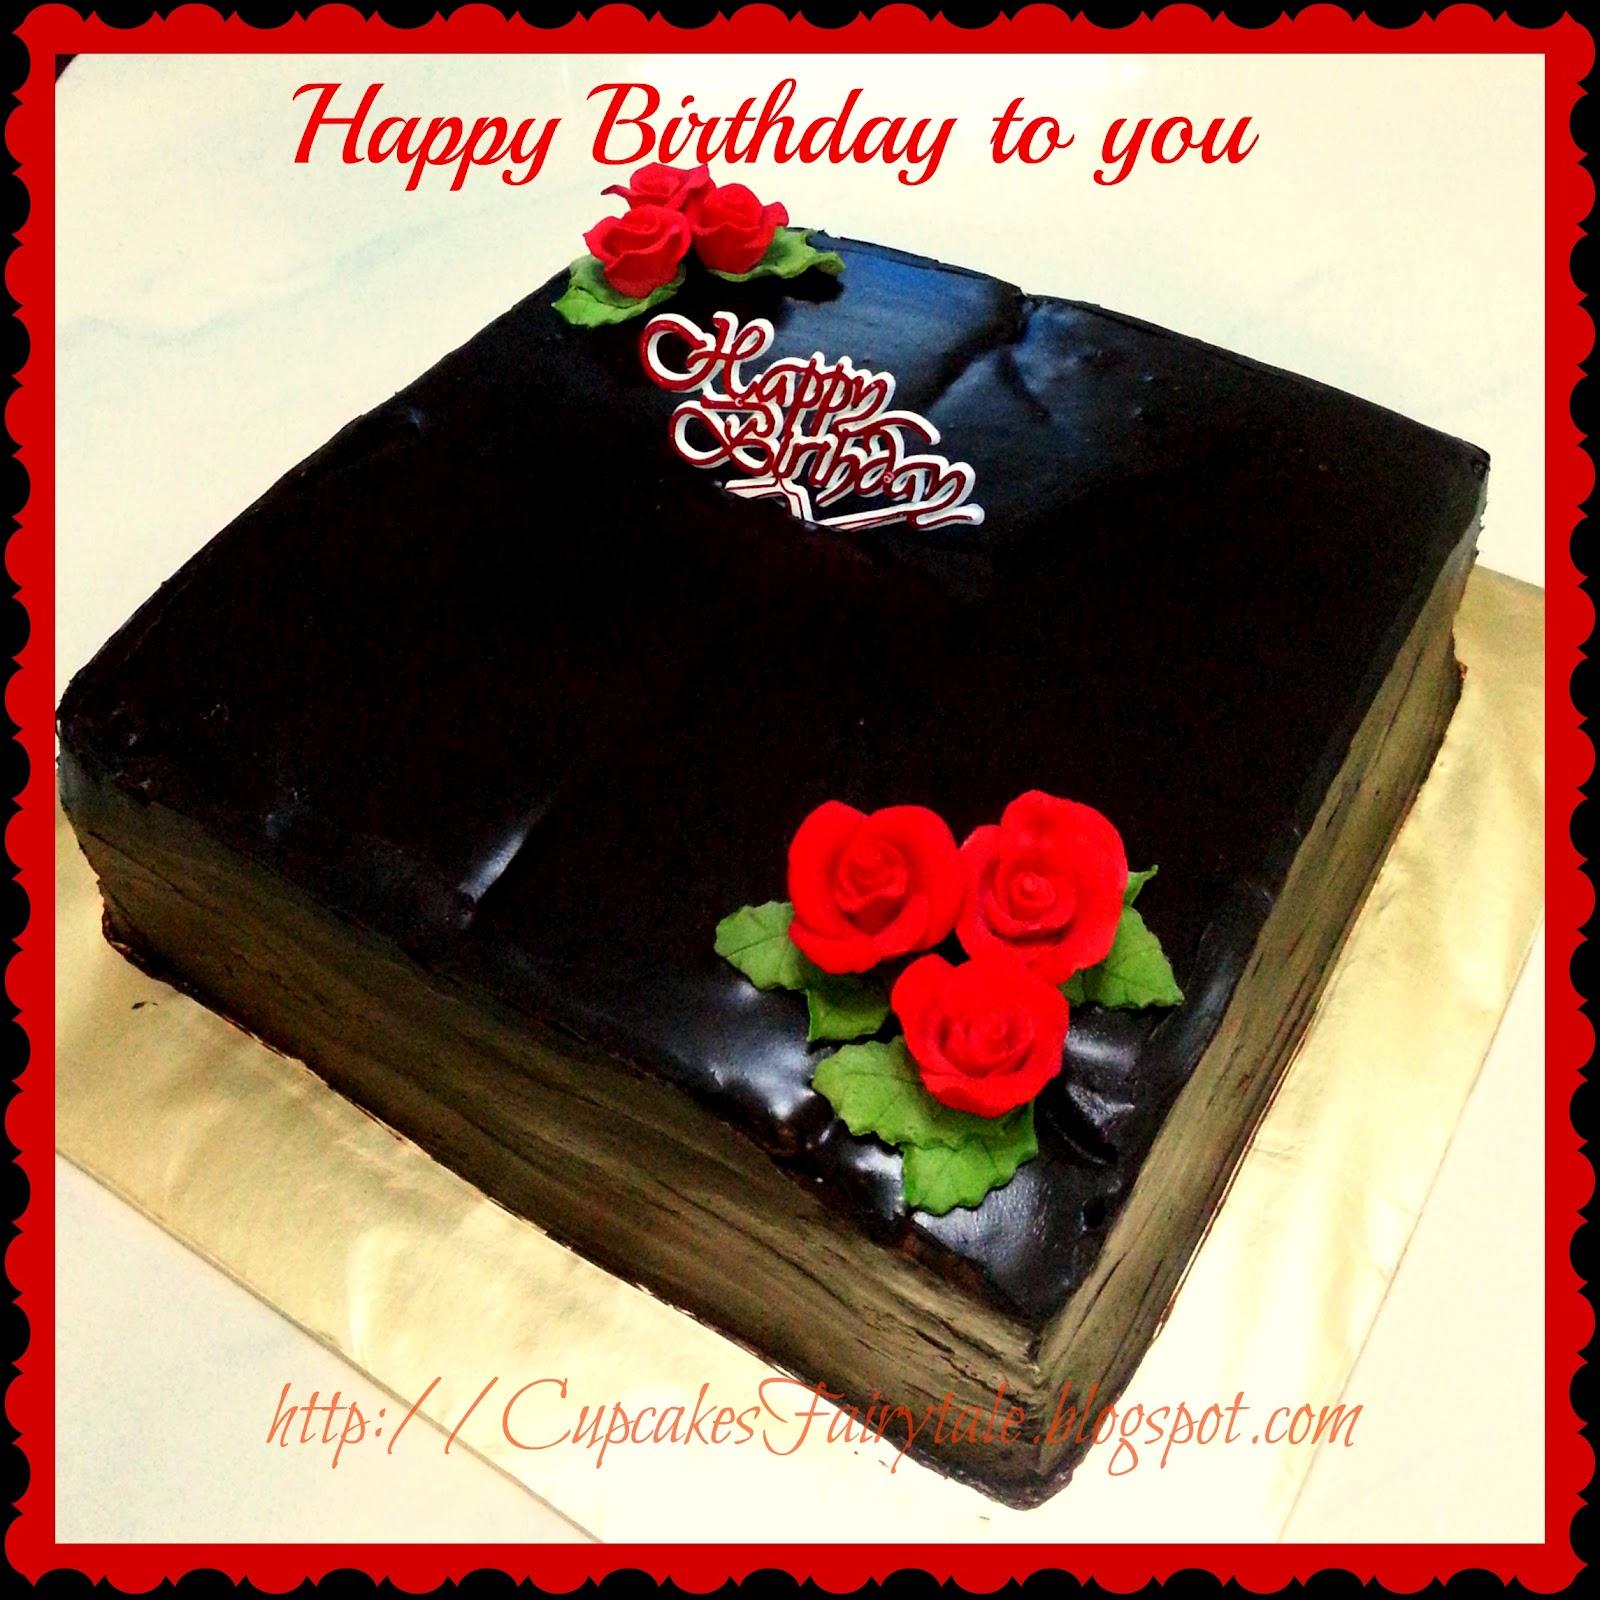 Cupcakes Fairytale YVONNE YEOS BIRTHDAY CAKE FOR HUBBY